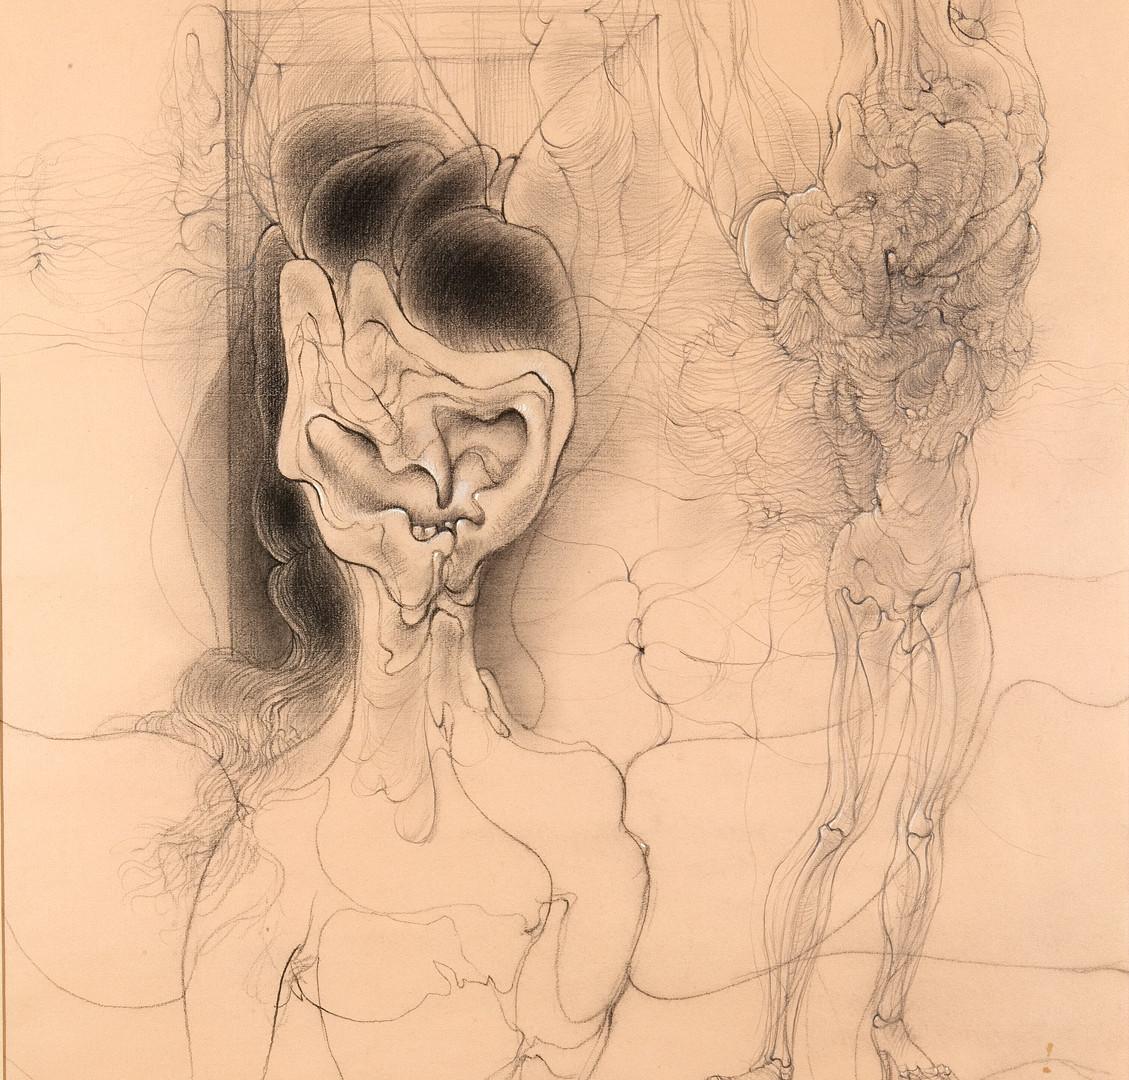 Hans Bellmer (German, 1902-1975), Untitled (deux personnages), 1960